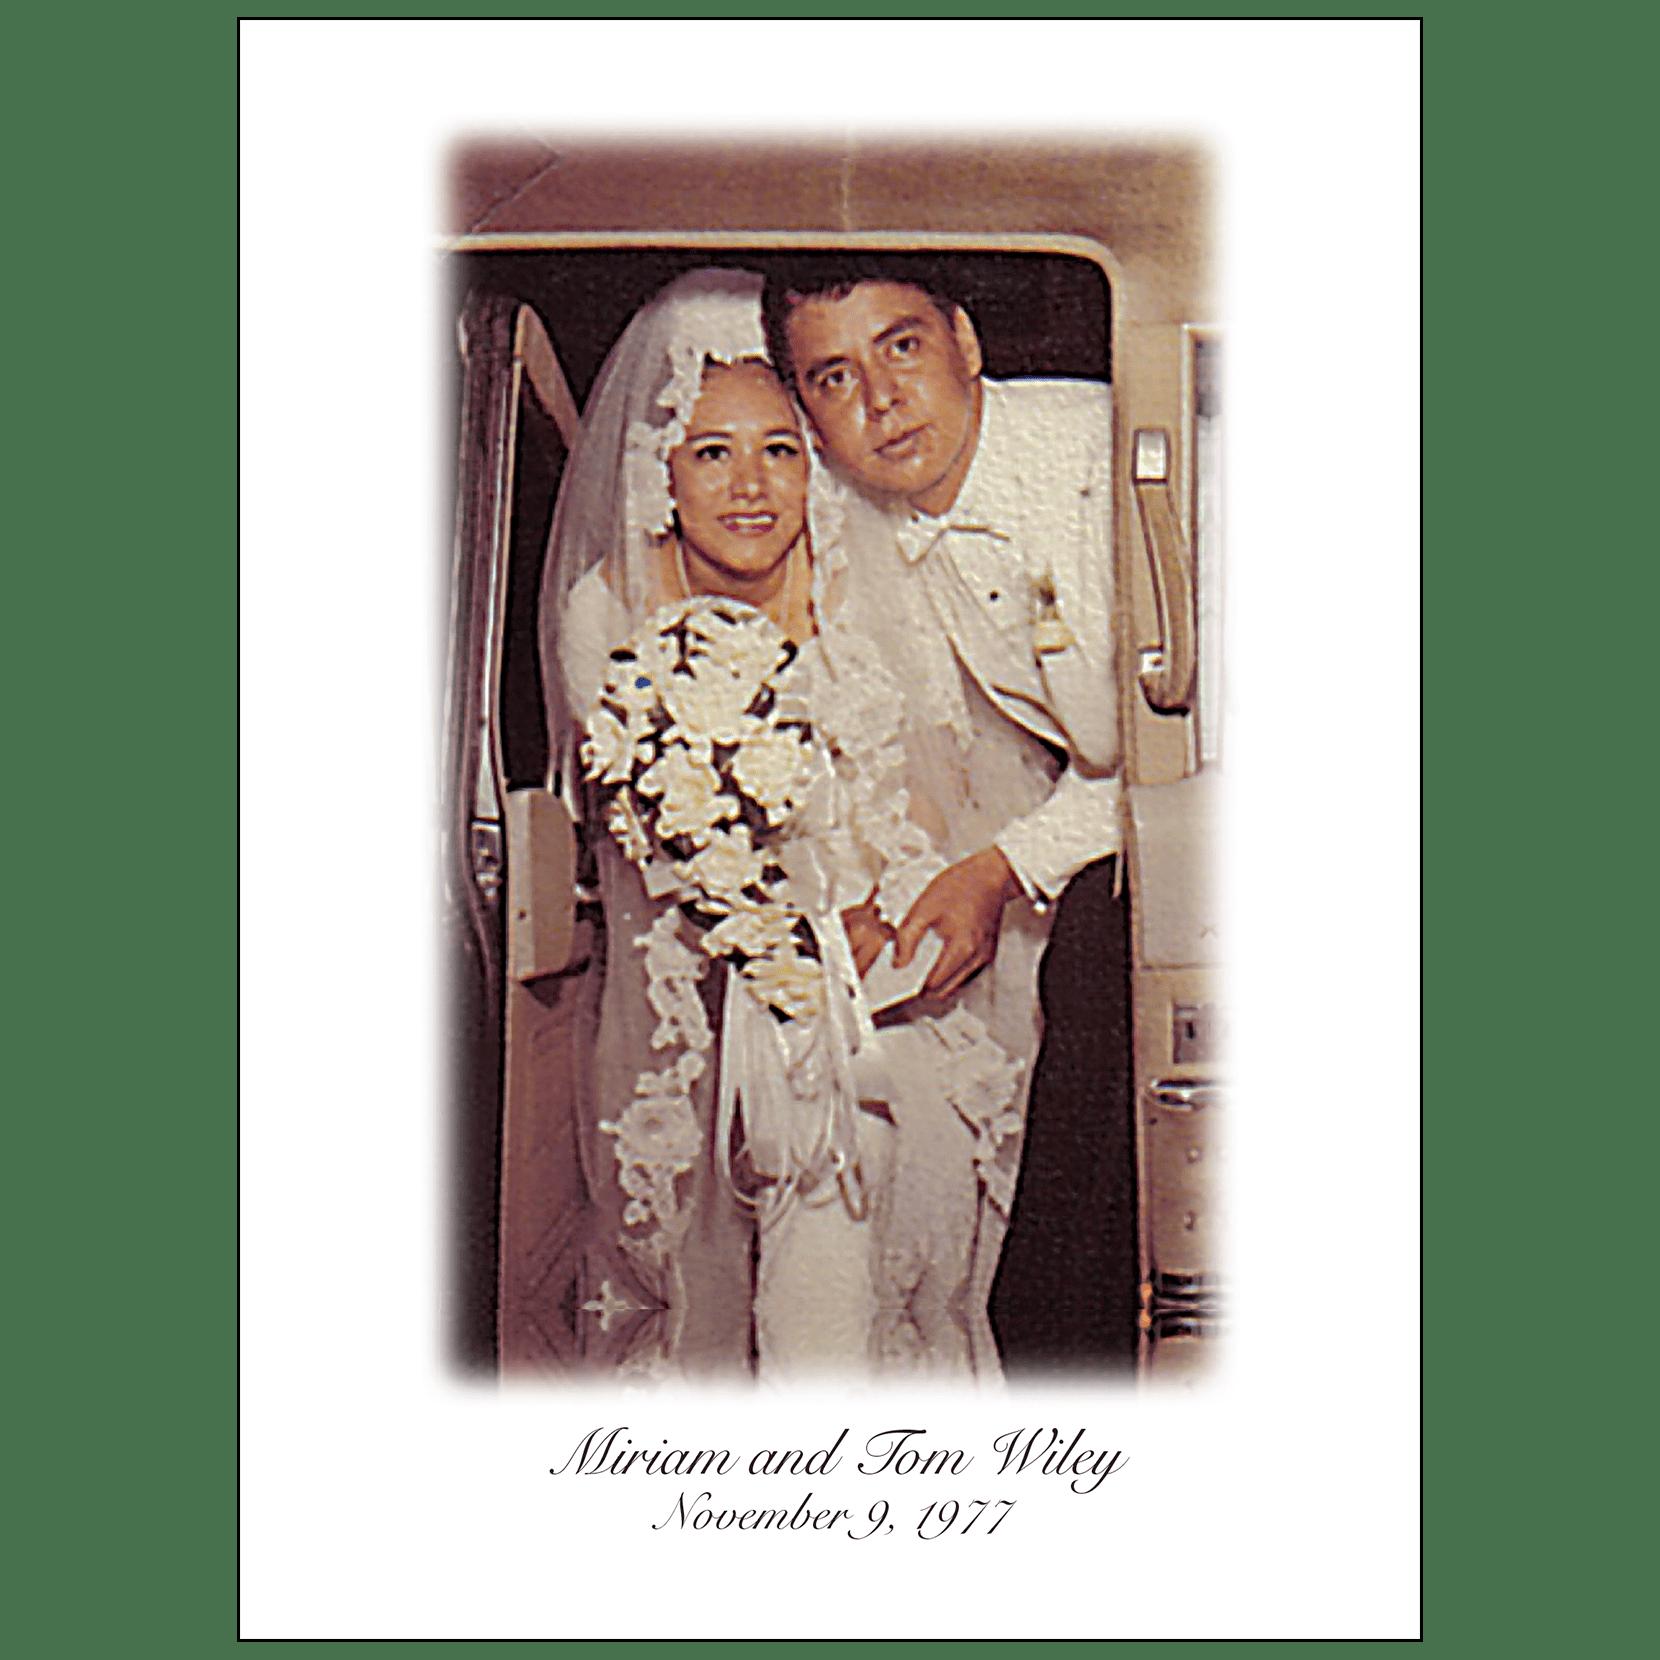 40th Wedding Anniversary Party Invitation Style 1b Ipv Studio